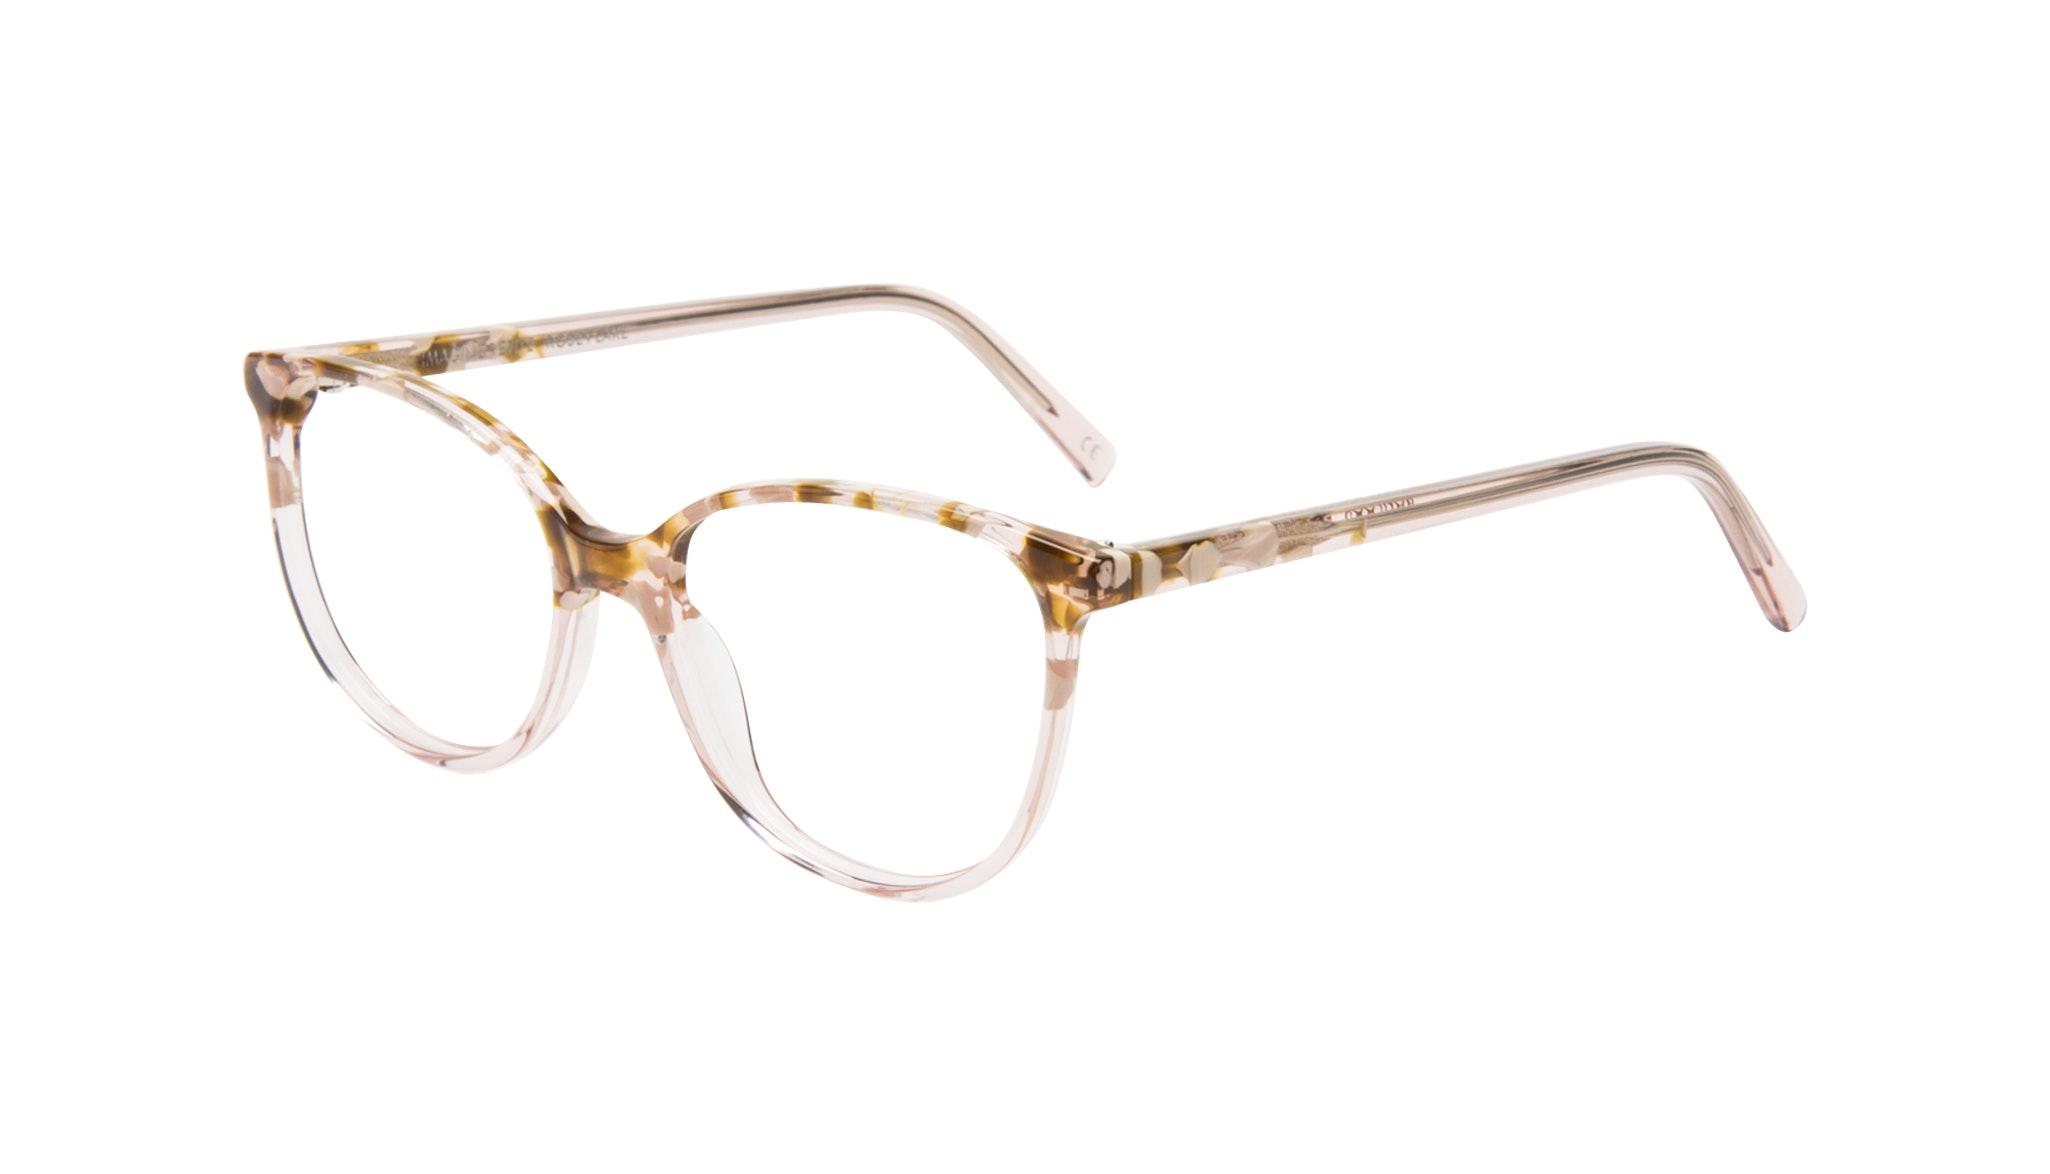 Affordable Fashion Glasses Round Eyeglasses Women Imagine Petite Rose Flake Tilt